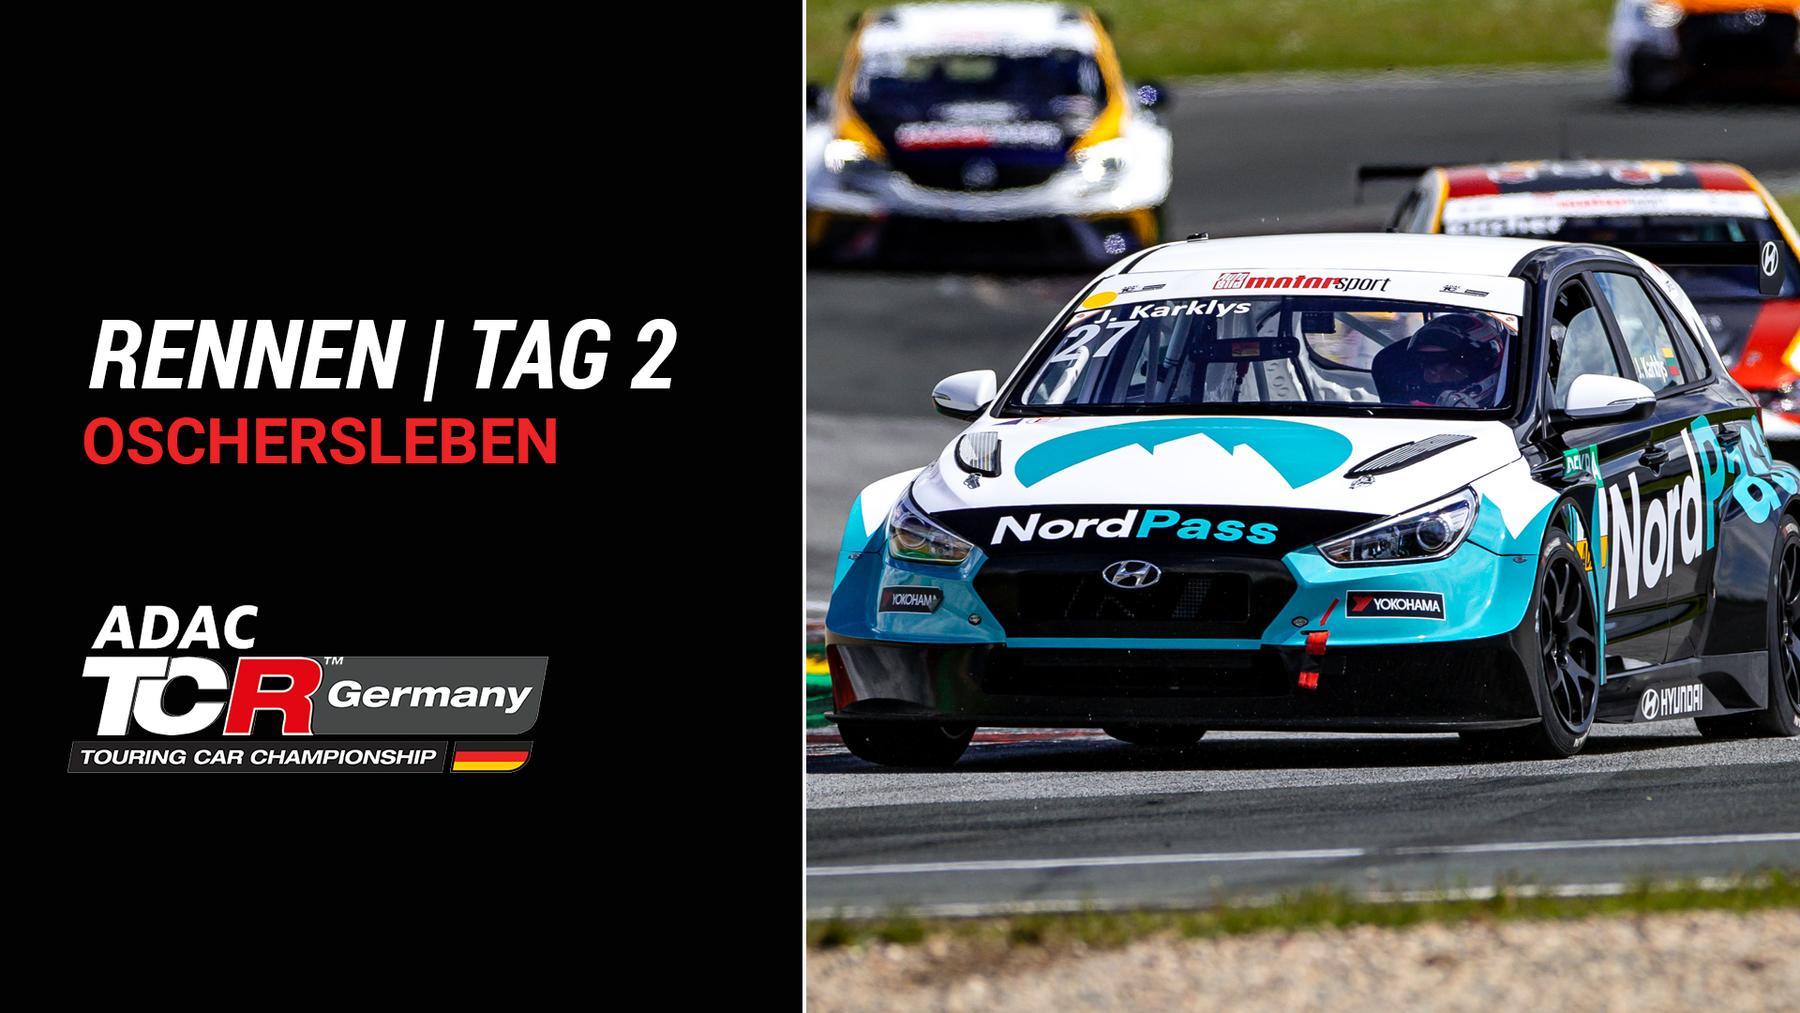 Oschersleben - Rennen 2